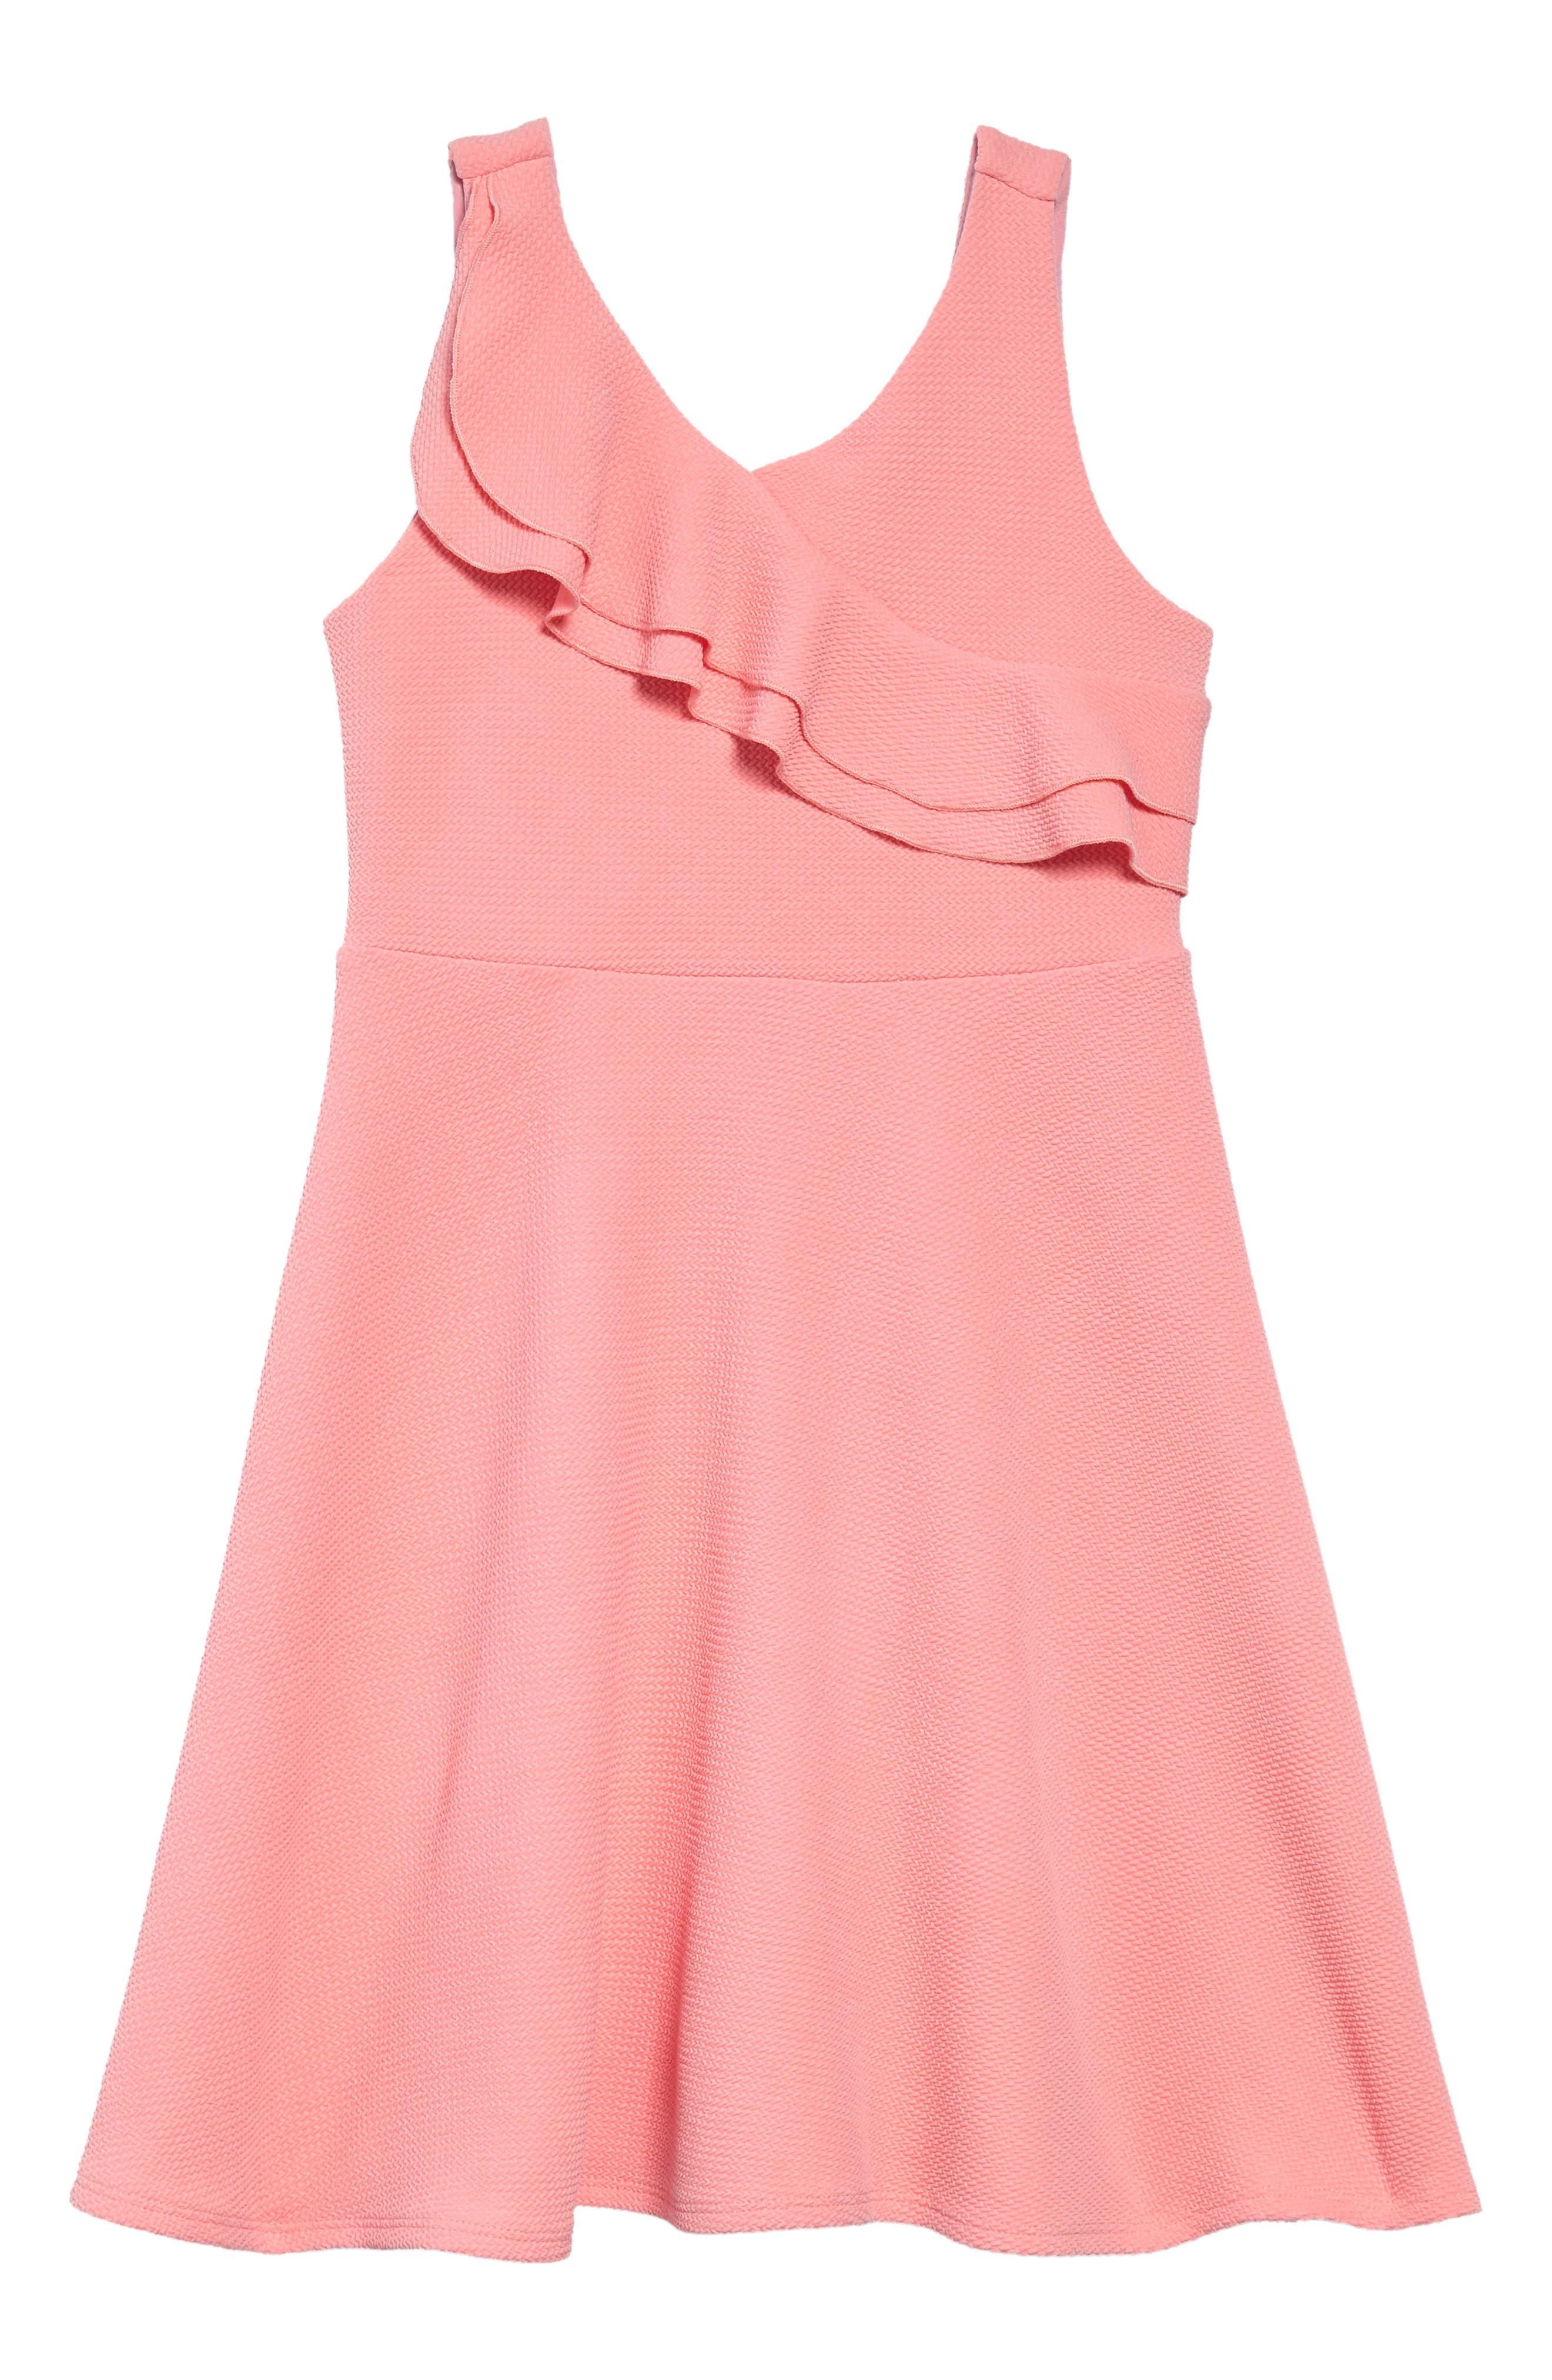 Double Ruffle Dress,                             Main thumbnail 1, color,                             PEACH